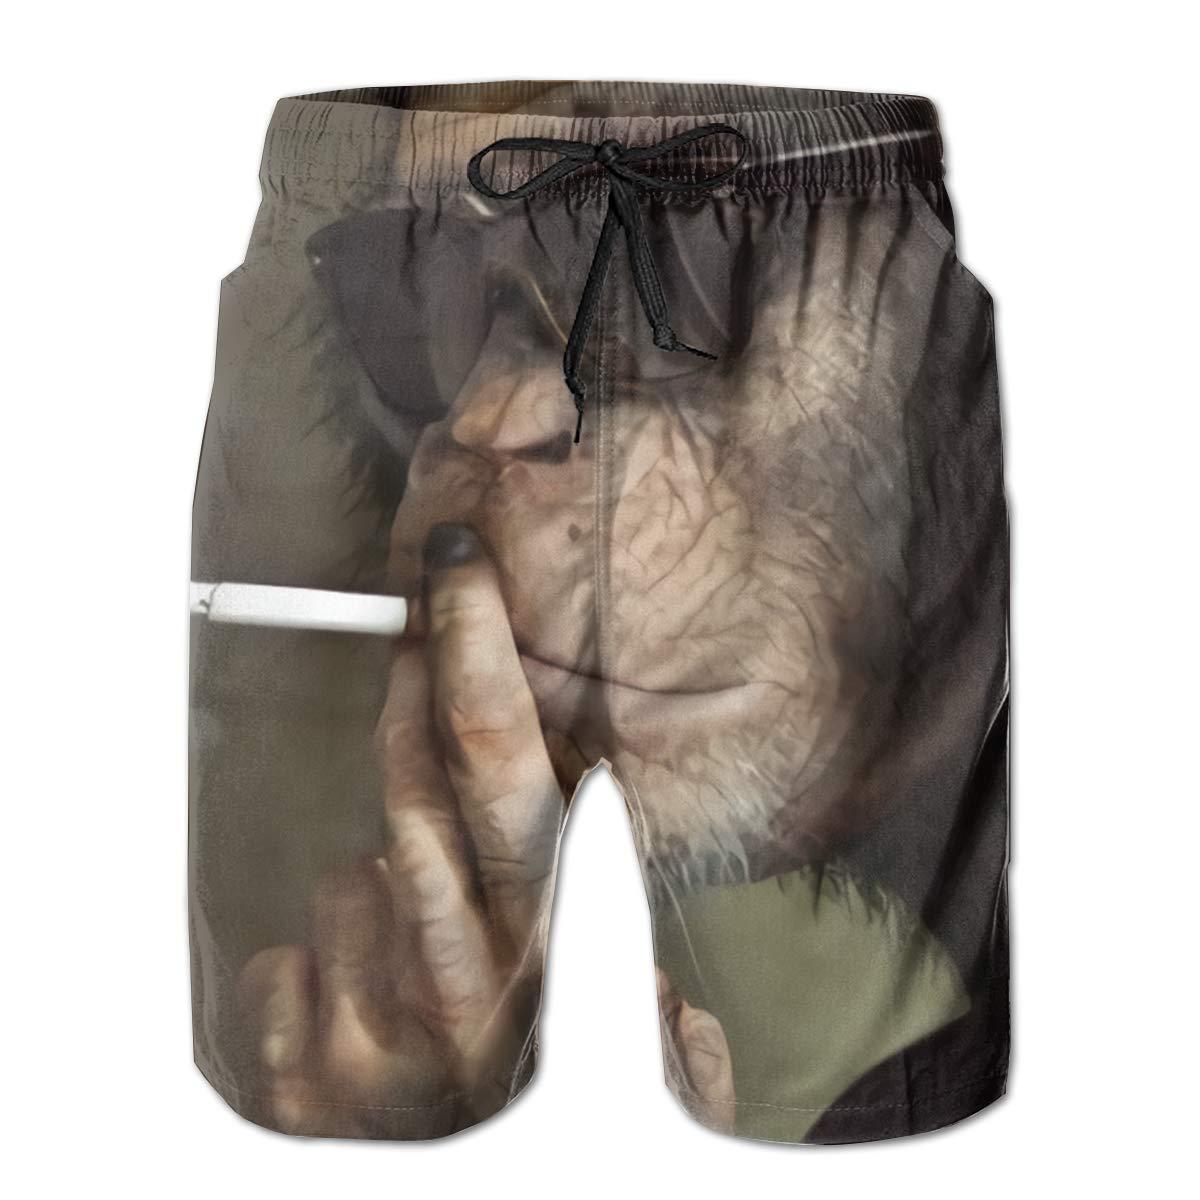 KGNVNA Smoke Monkey Mens Slim Fit Ultra Quick Dry Board Shorts Swim Trunks,Best Board Shorts for Sports Running